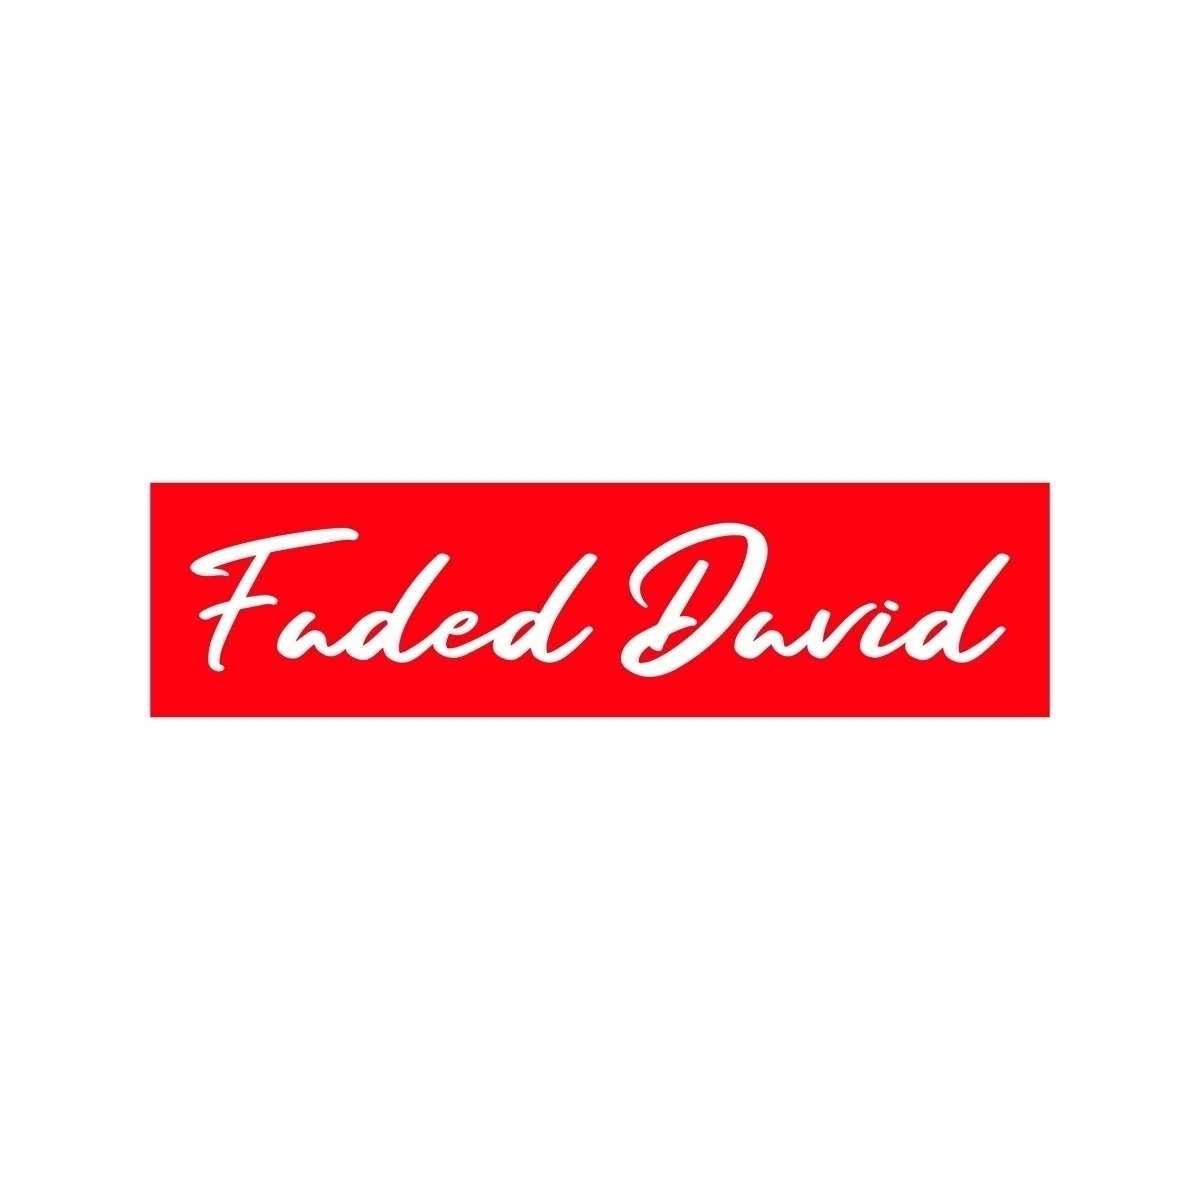 Capn_fadeddavid (@capnfadeddavid) Cover Image